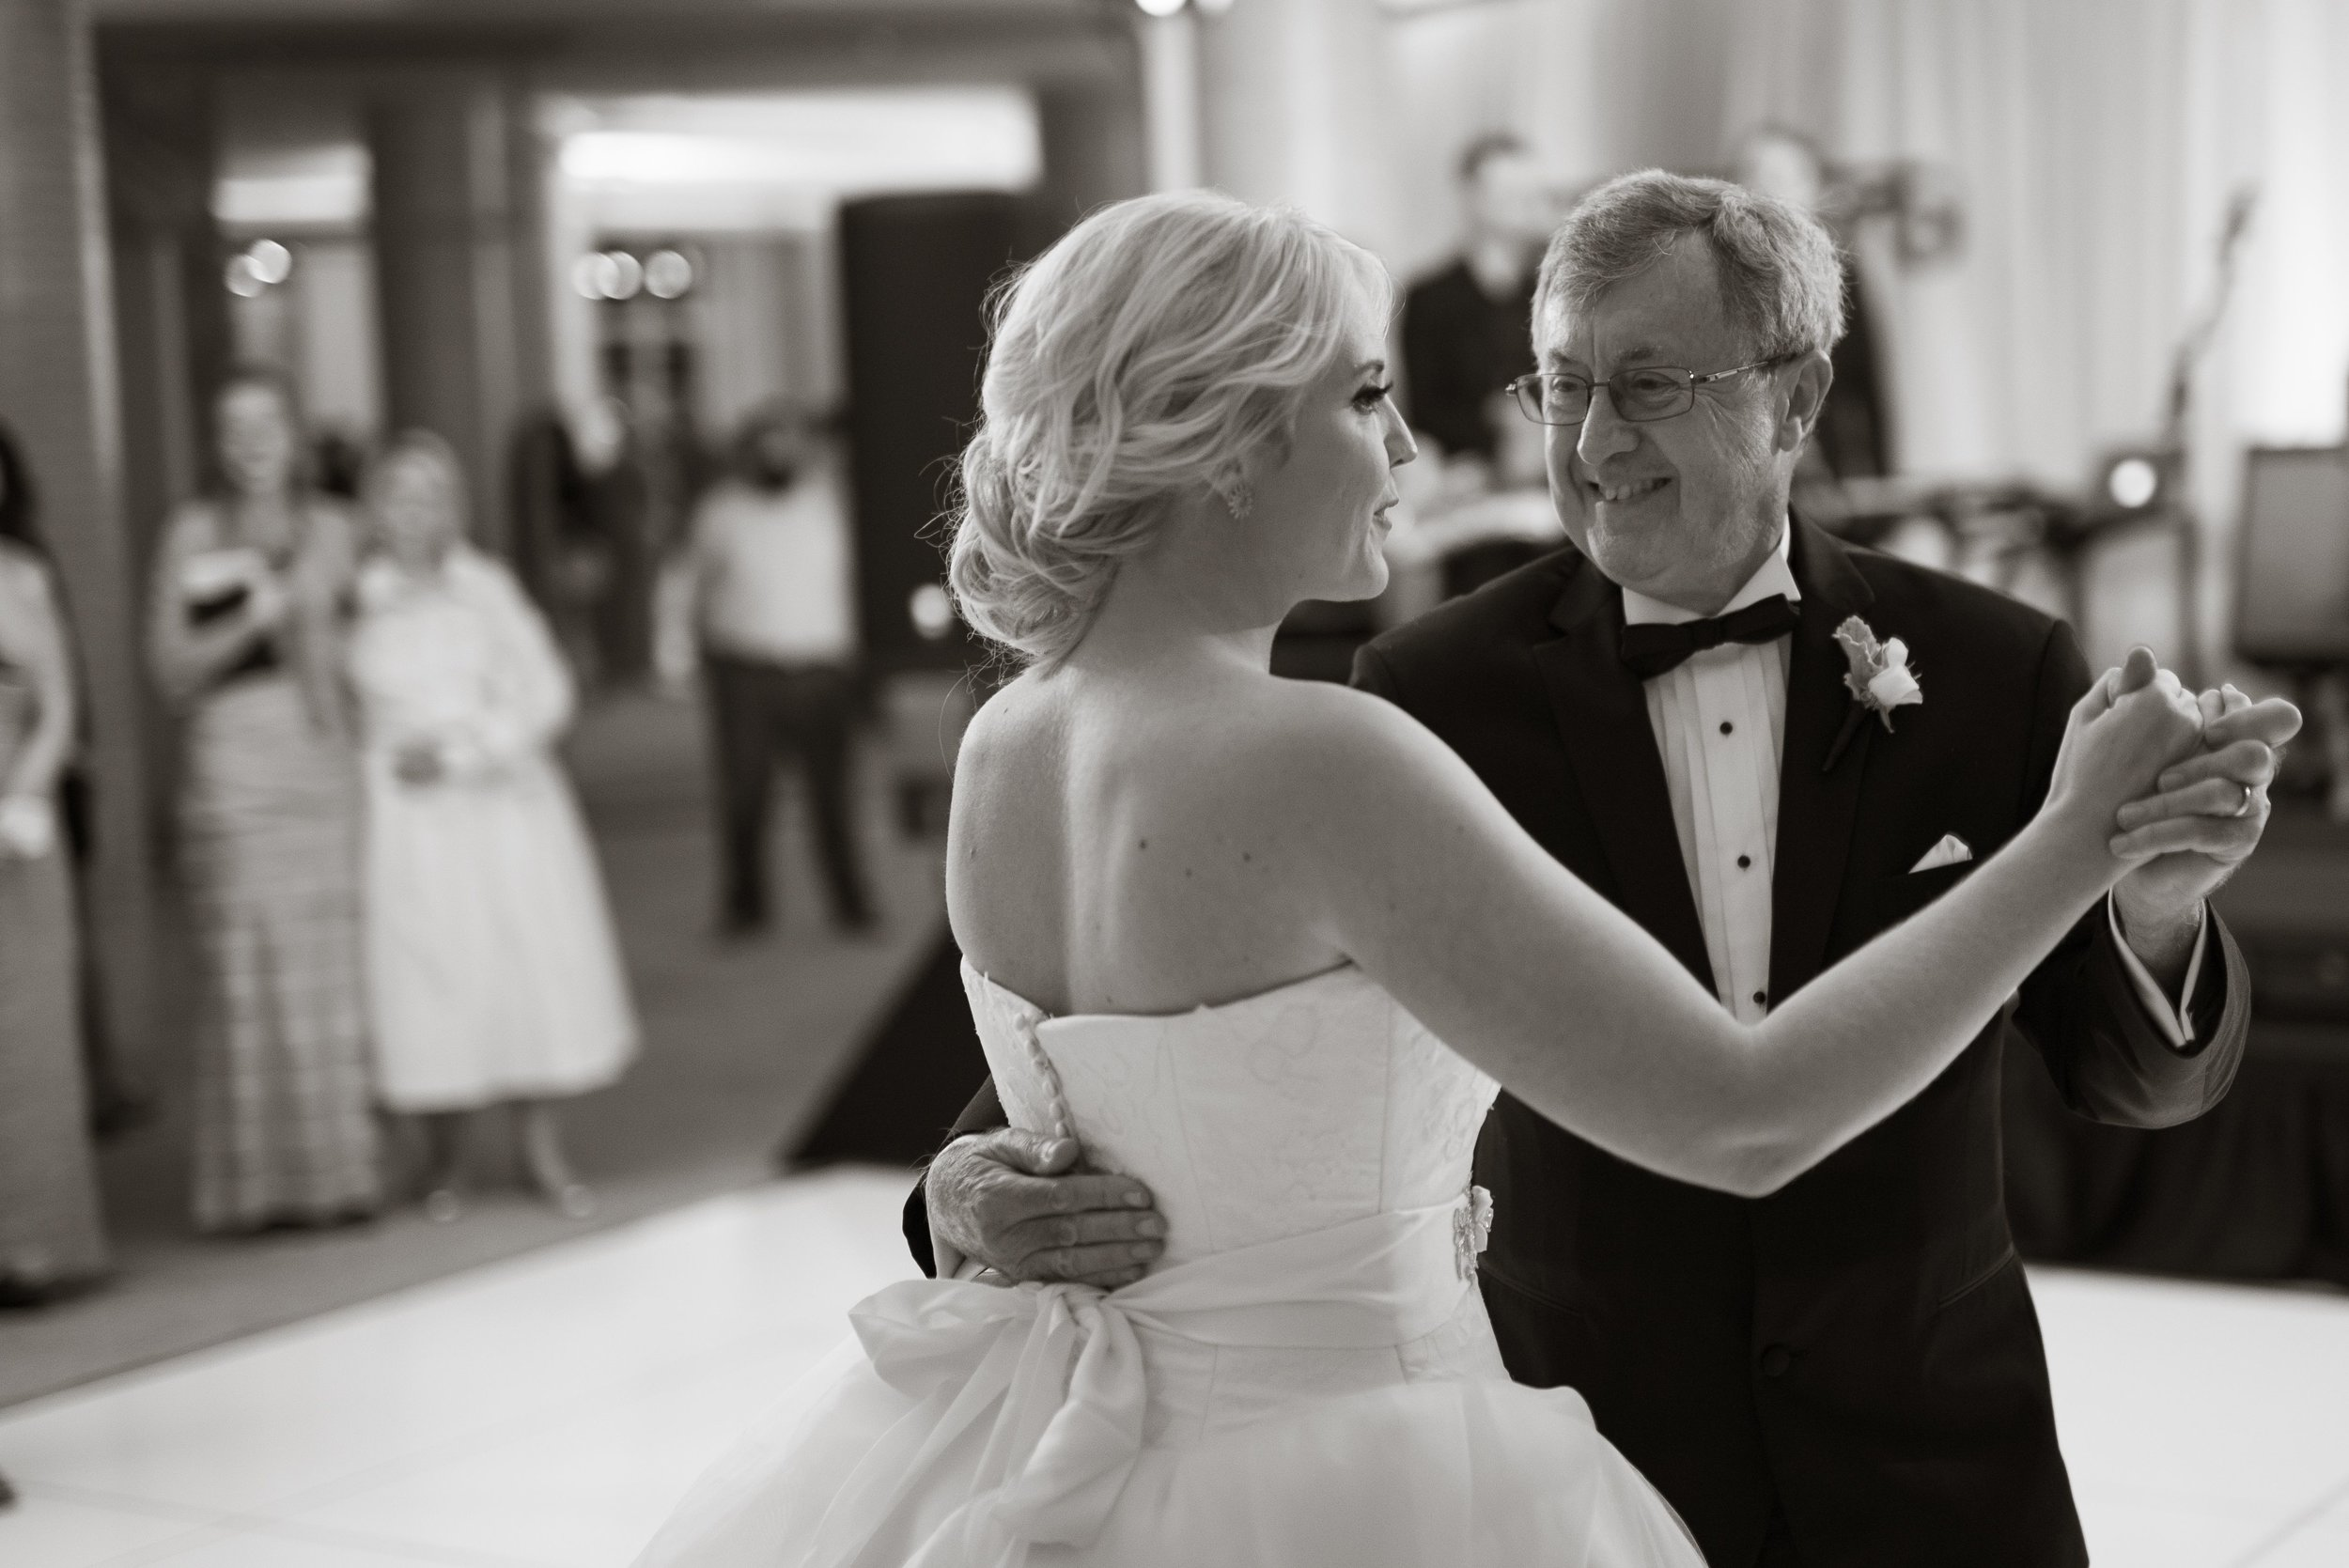 www.santabarbarawedding.com | Nate & Jenny Weddings | Four Seasons Resort The Biltmore | Ann Johnson Events | Jon Harris | Bella Vista Designs | Father-Daughter Dance